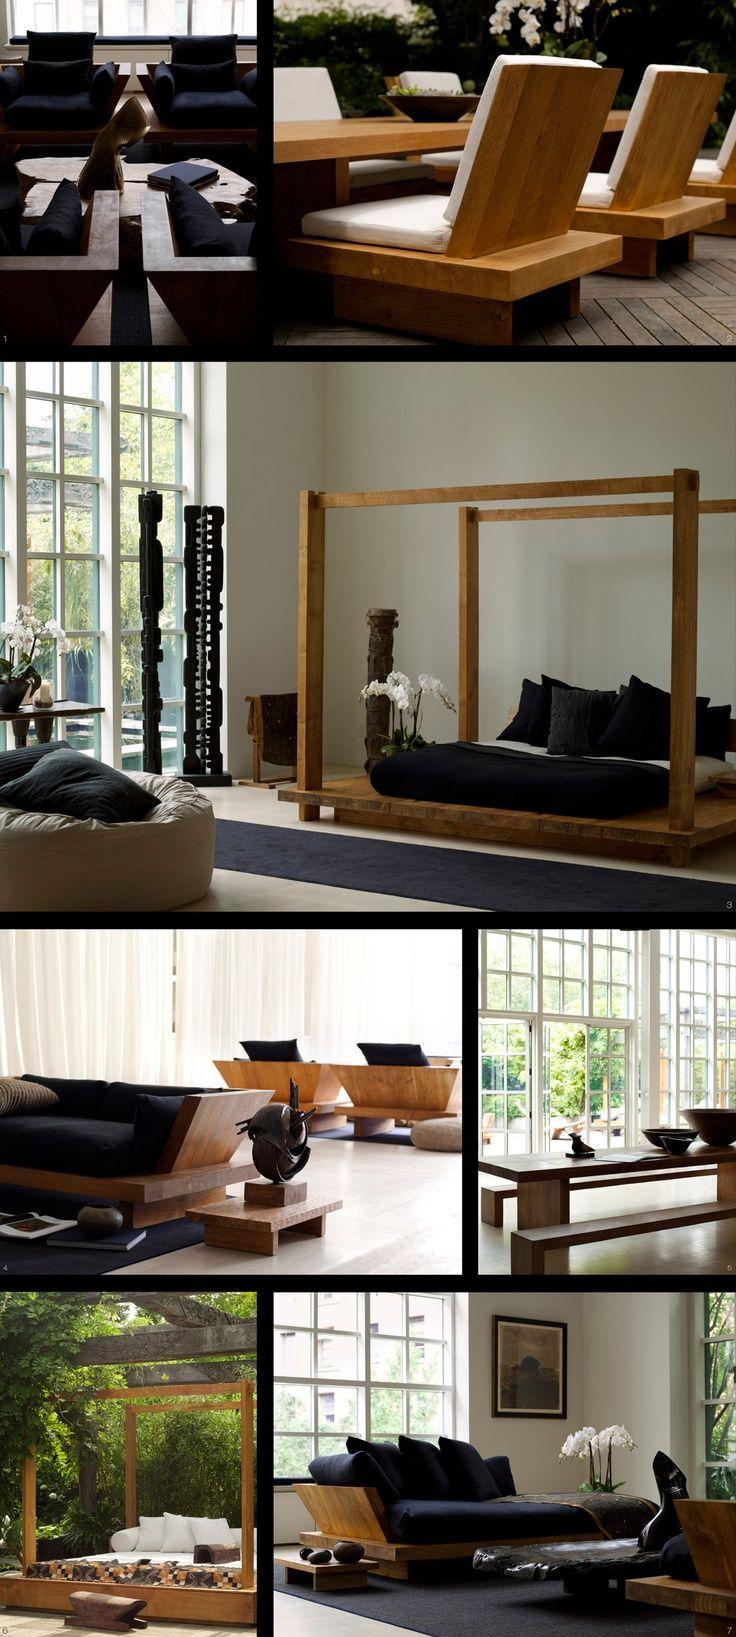 urban house furniture. Urban Zen Home Collection By Donna Karan House Furniture